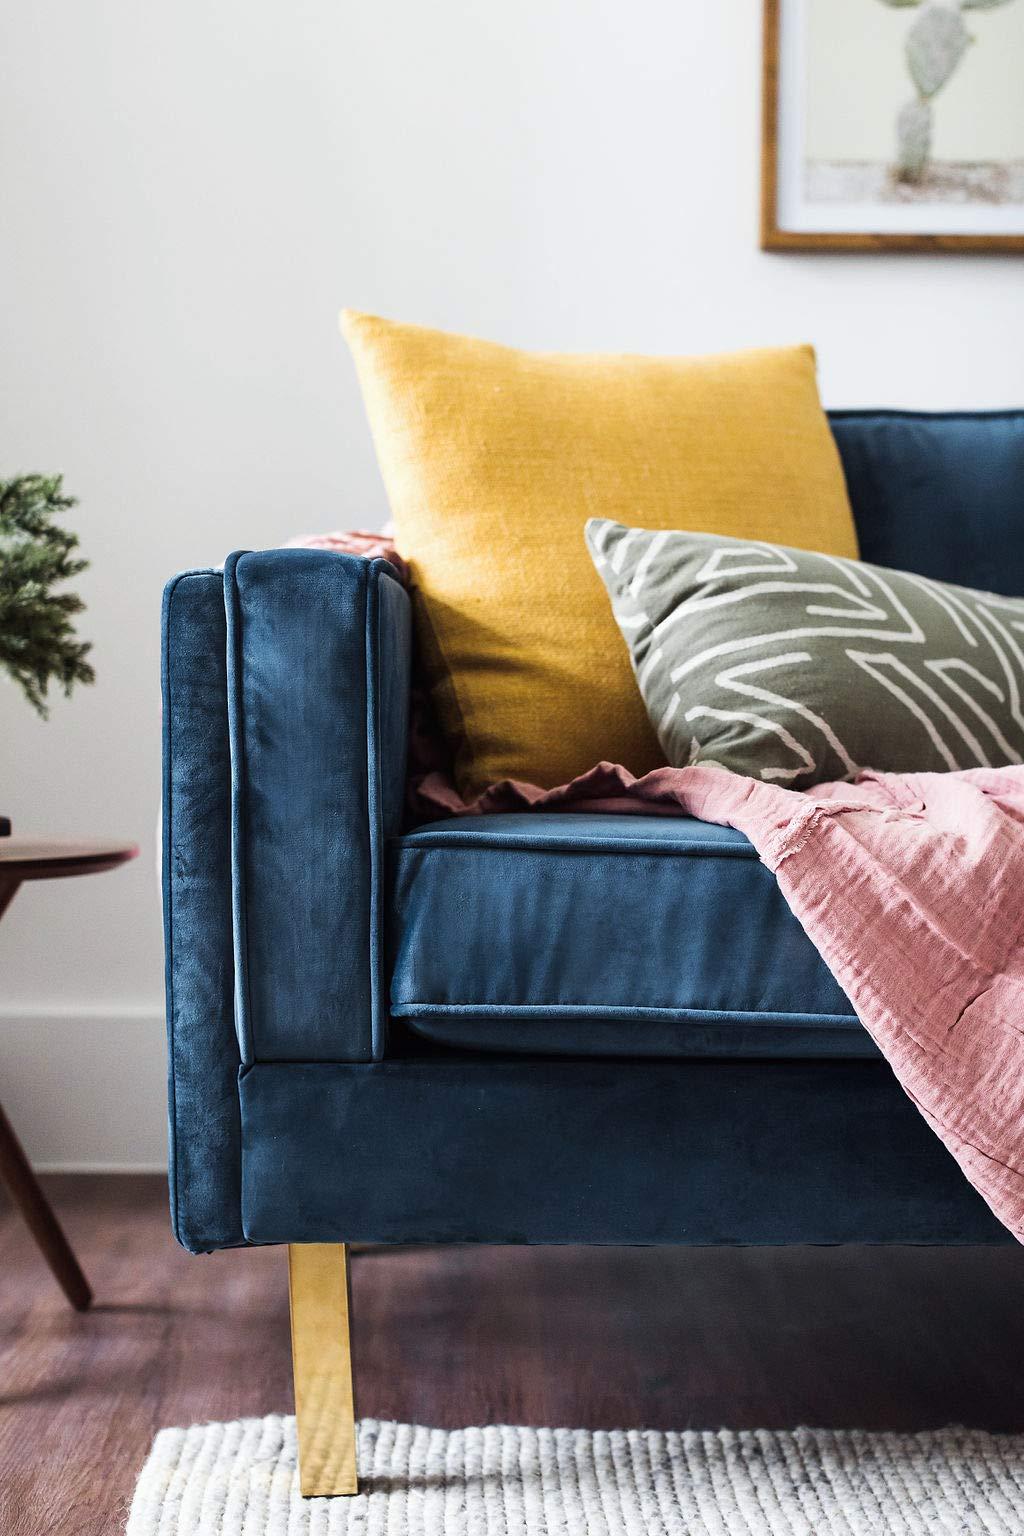 Stupendous Edloe Finch Midcentury Modern Lexington Blue Velvet Sofa 87 Bralicious Painted Fabric Chair Ideas Braliciousco